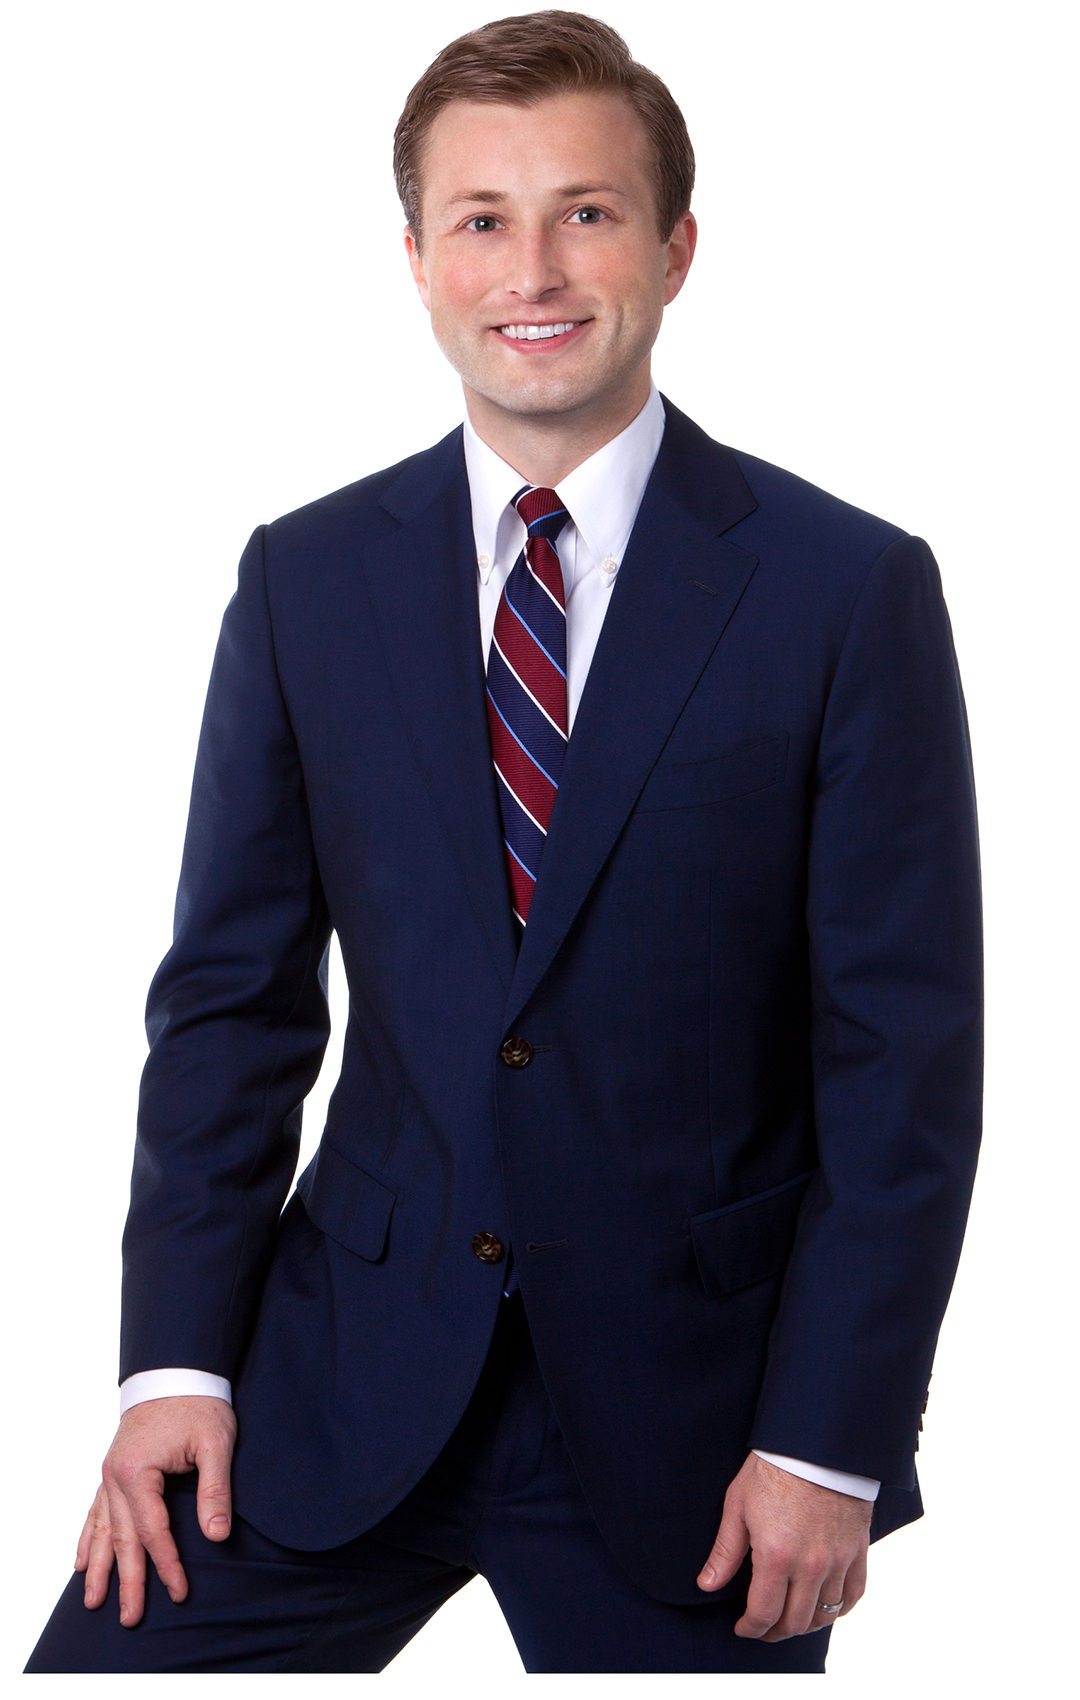 Thomas E. Kelly